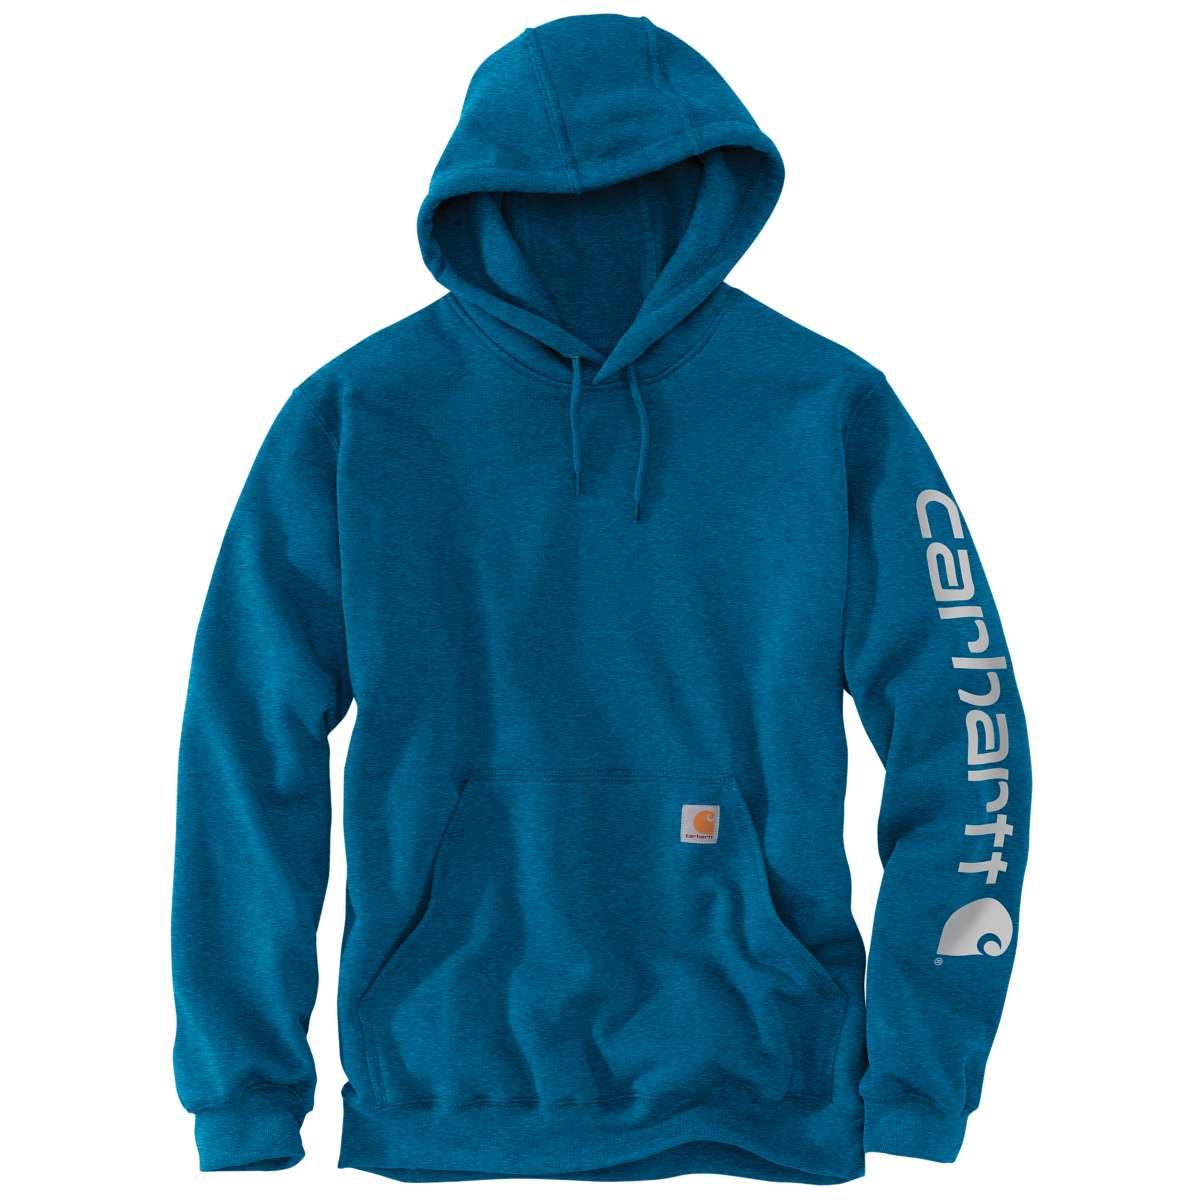 Carhartt Men's K288 Signature Sleeve Logo Hoodie, Extended Sizes - Blue, 4XL